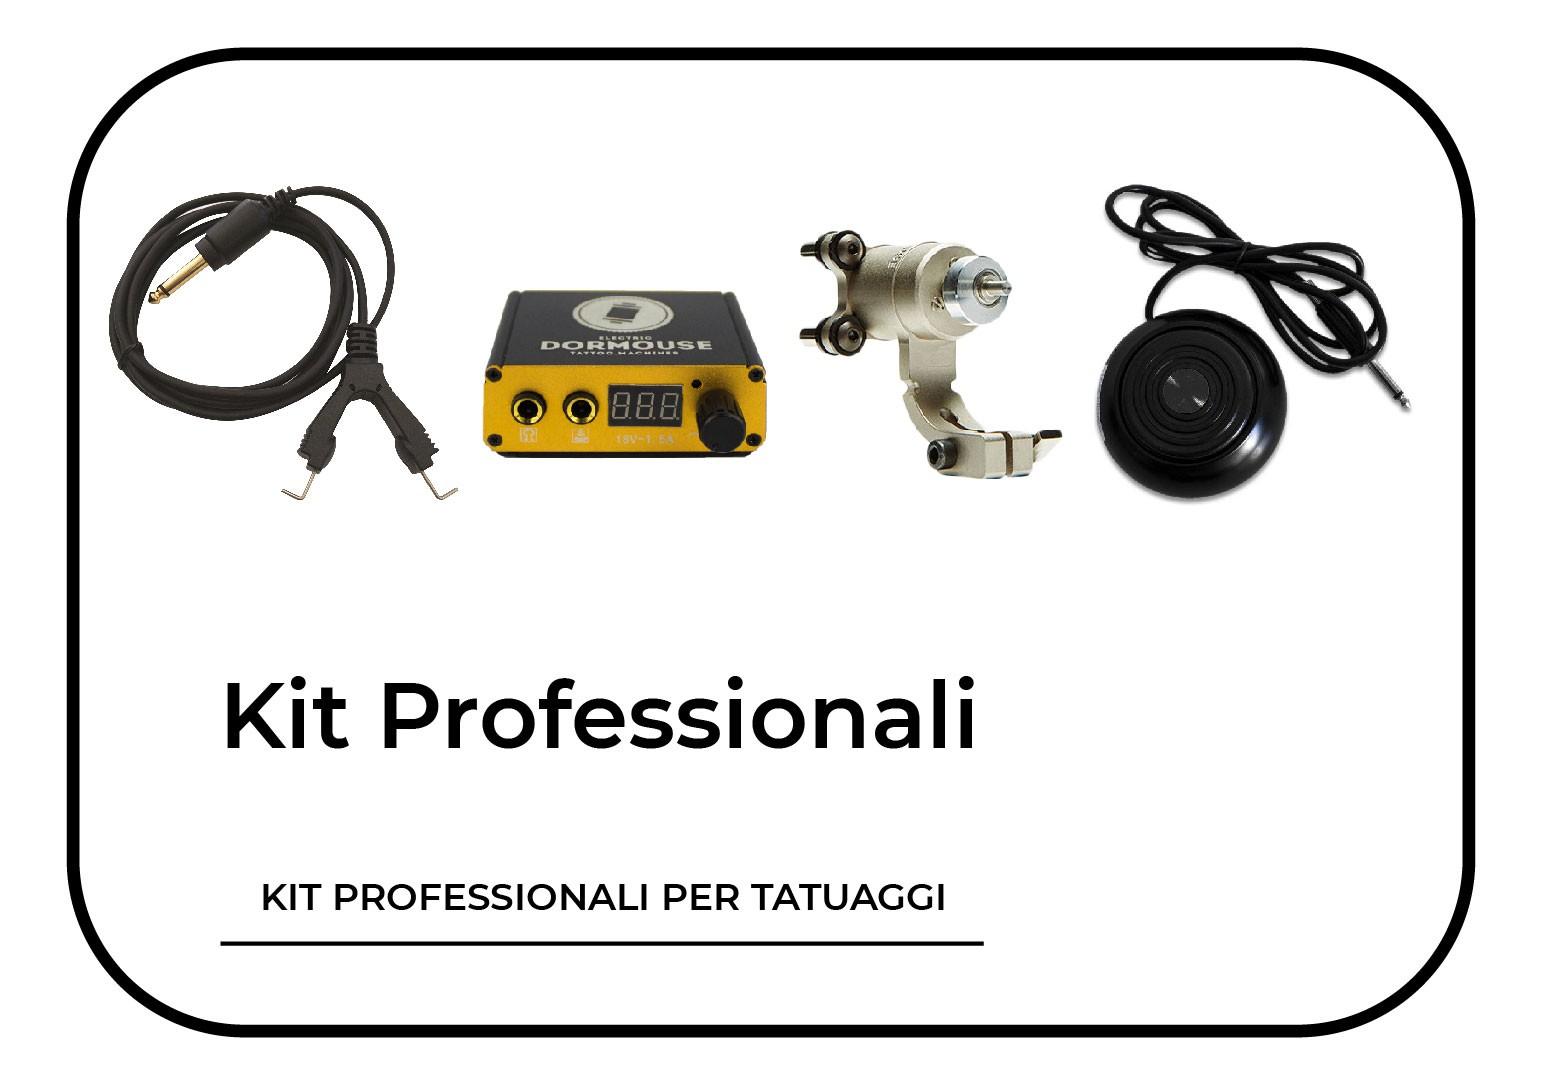 Kit Professionali